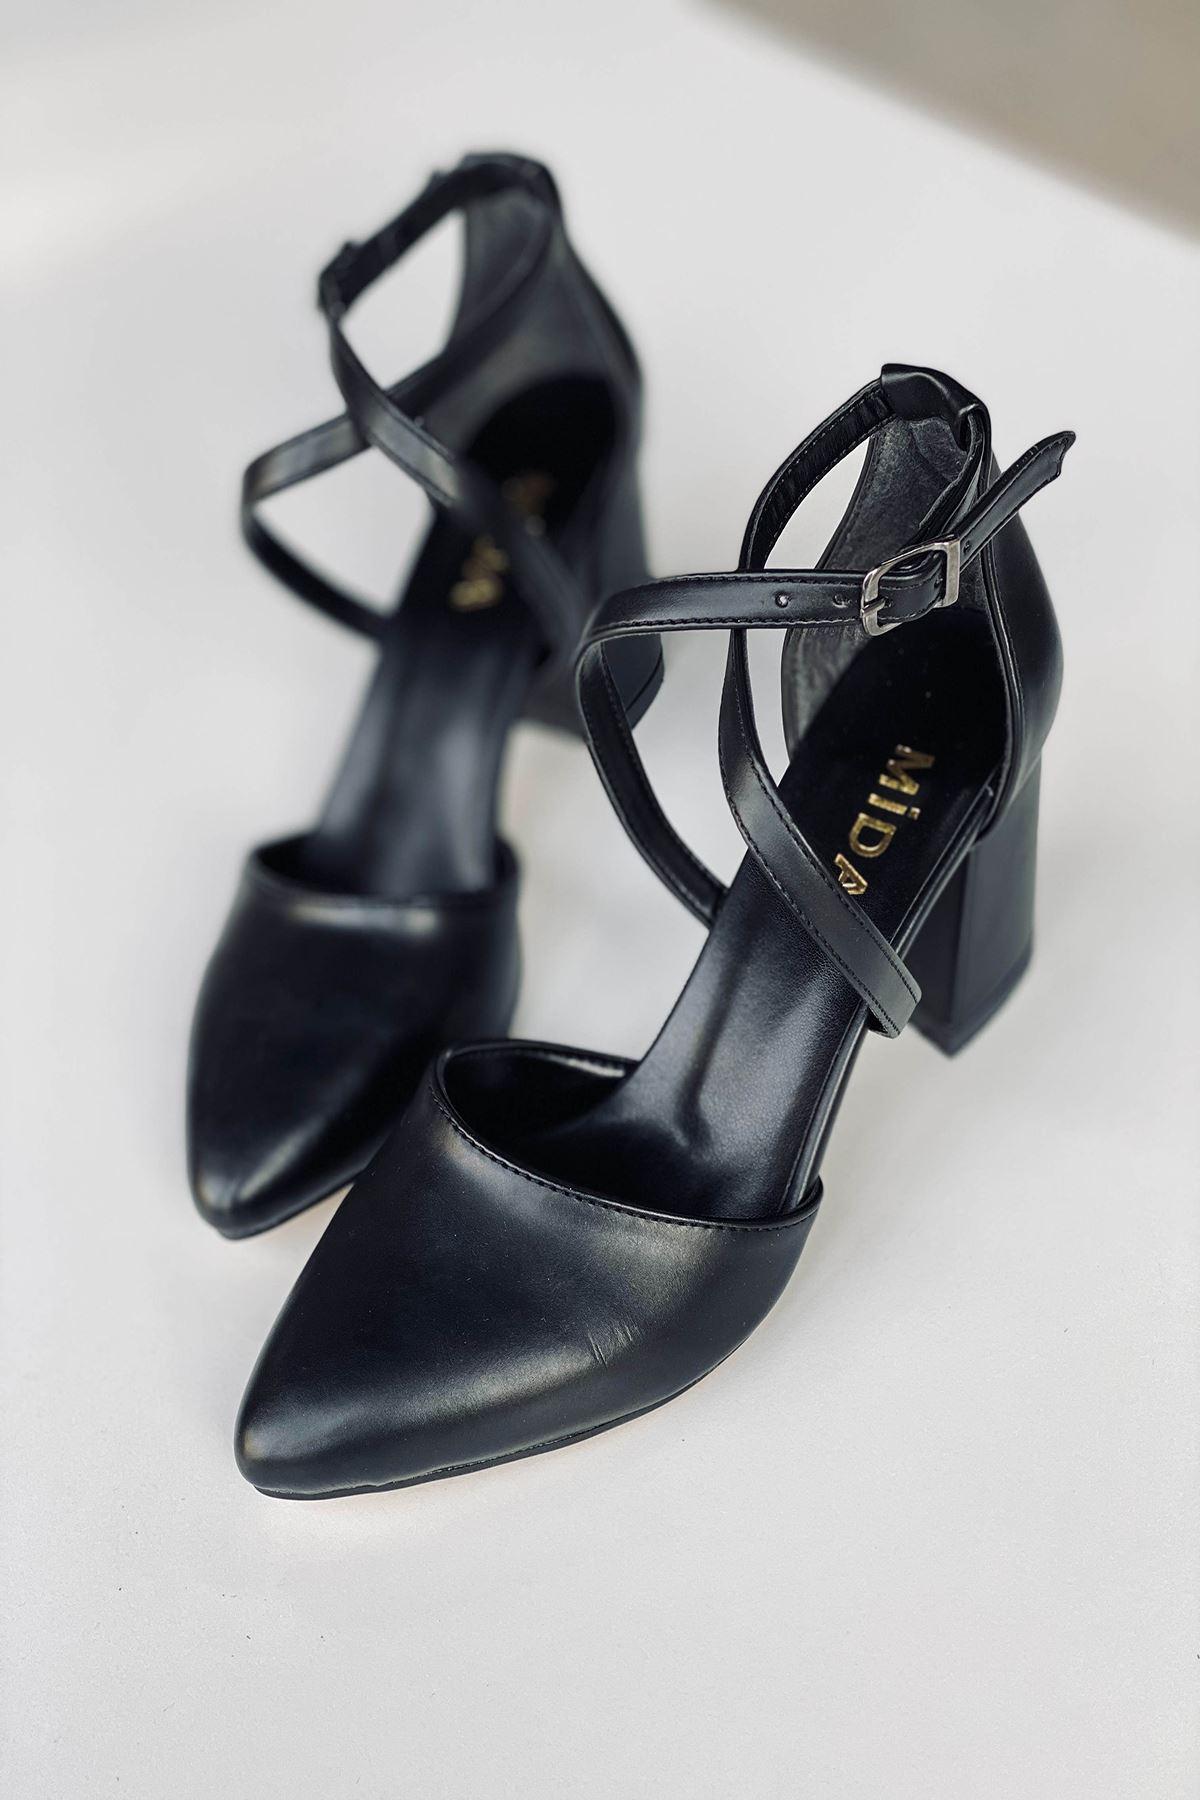 Y115 Siyah Deri Topuklu Ayakkabı